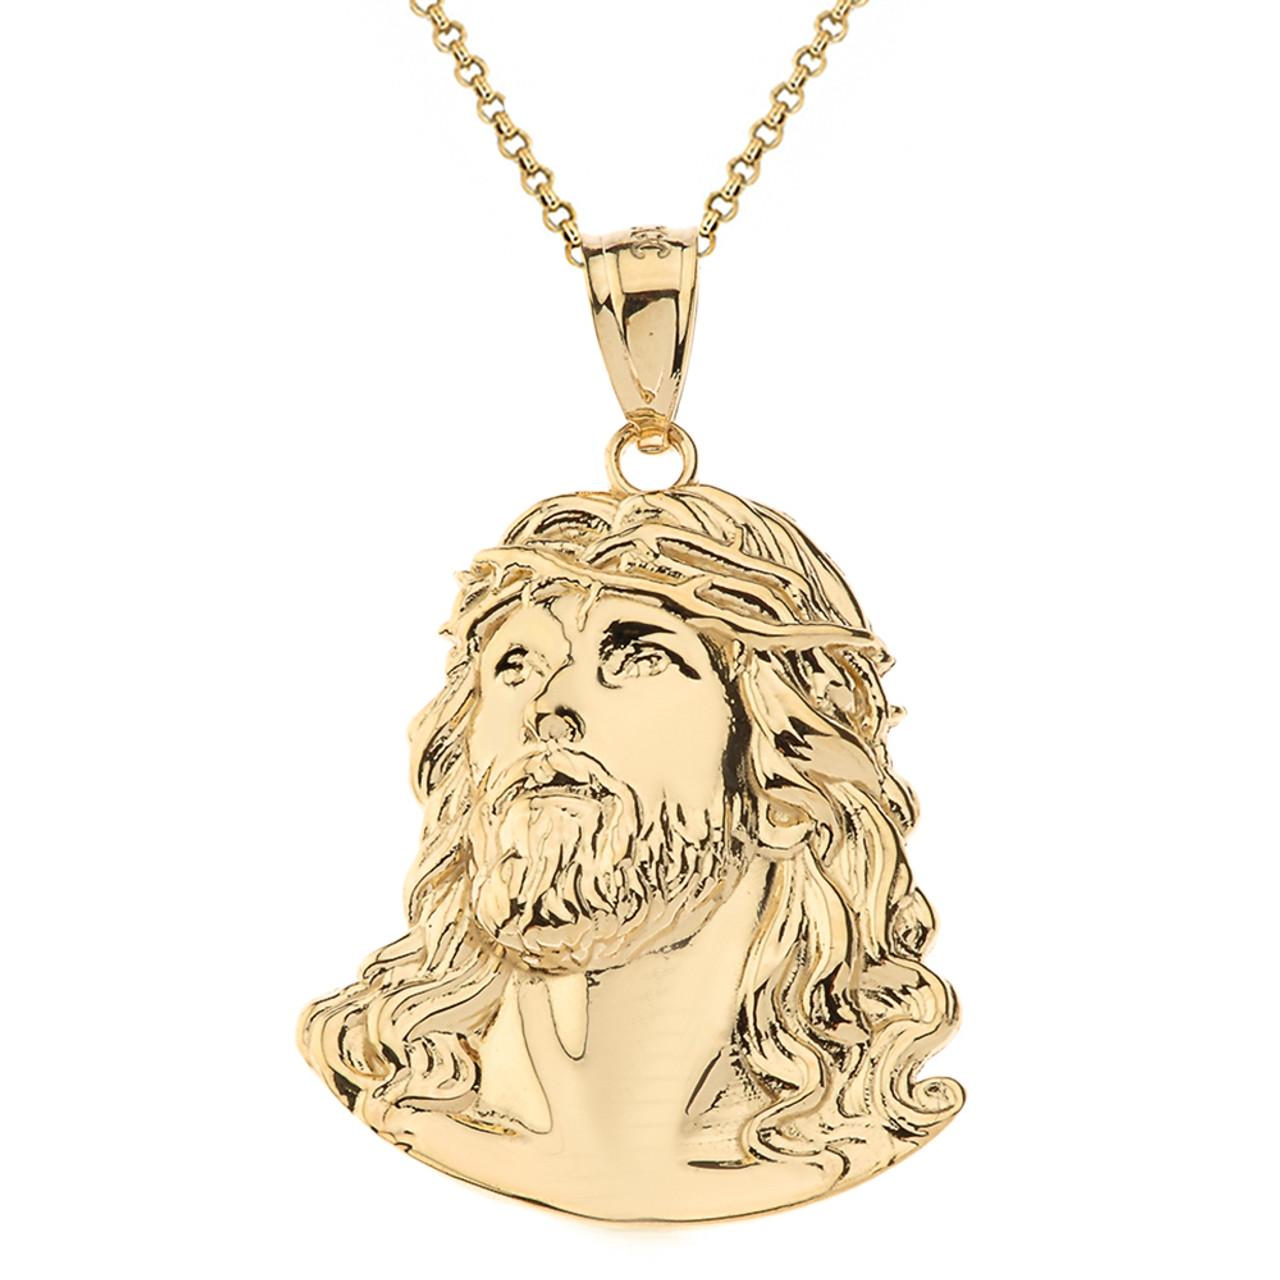 Jesus Christ Necklace